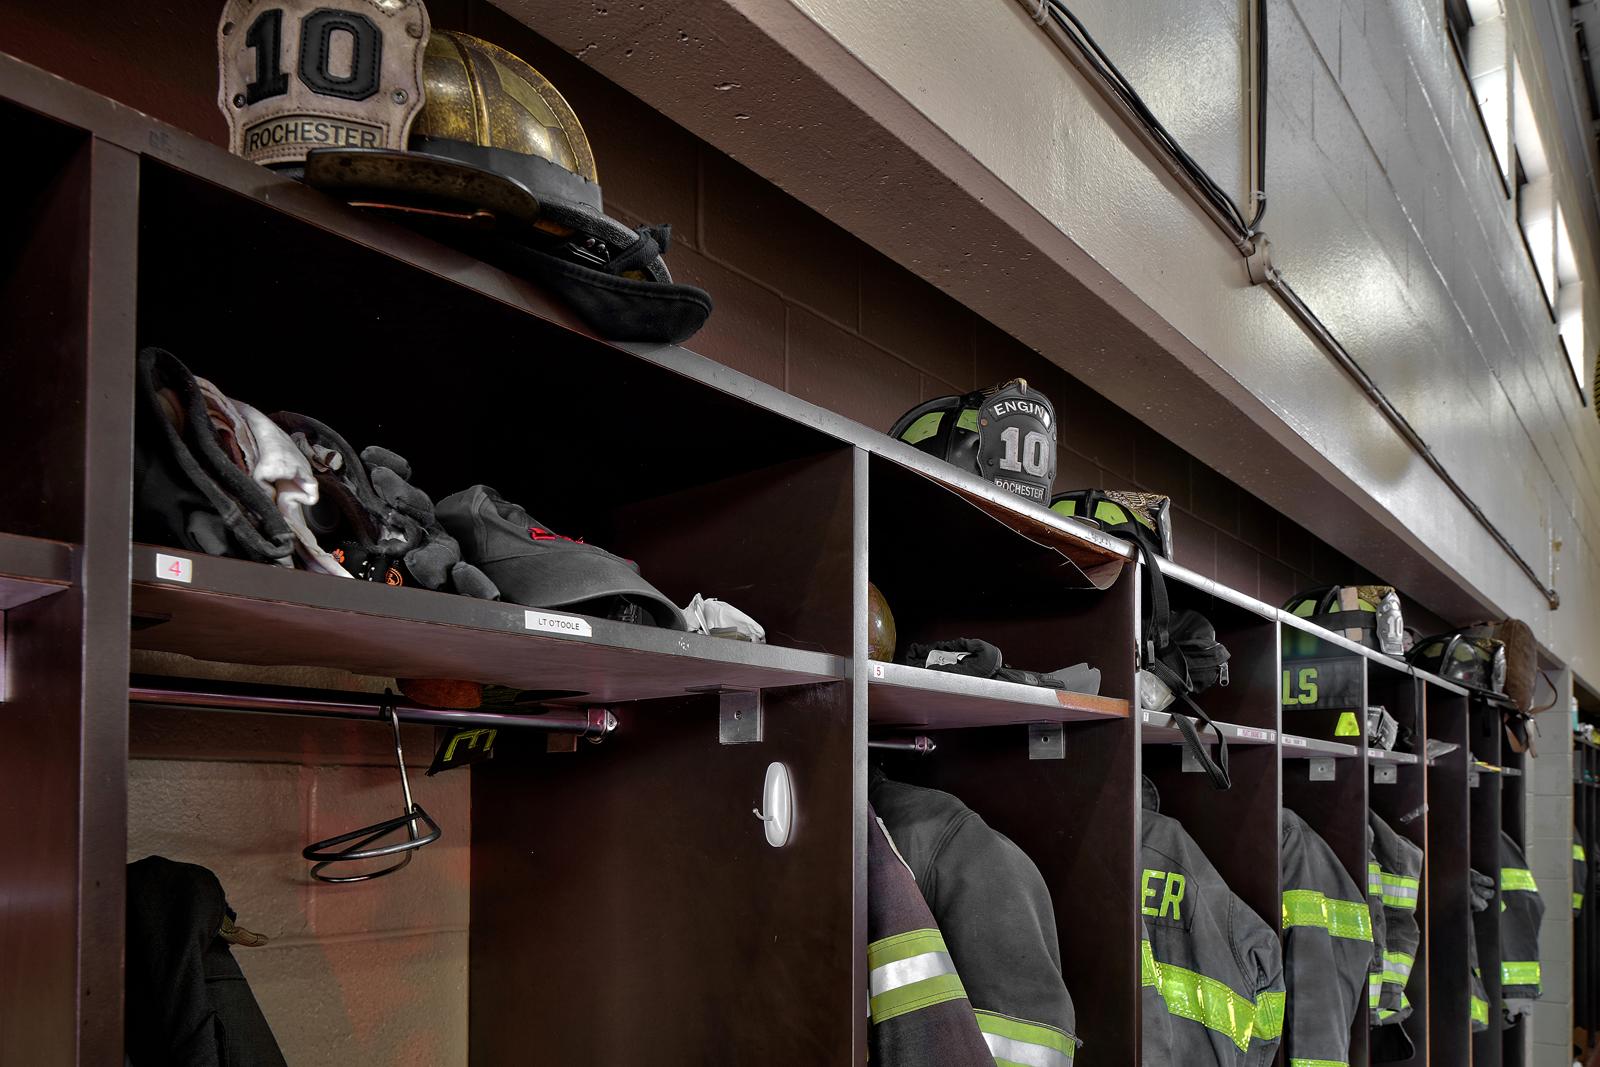 ridgeway-fs-lockers.jpg